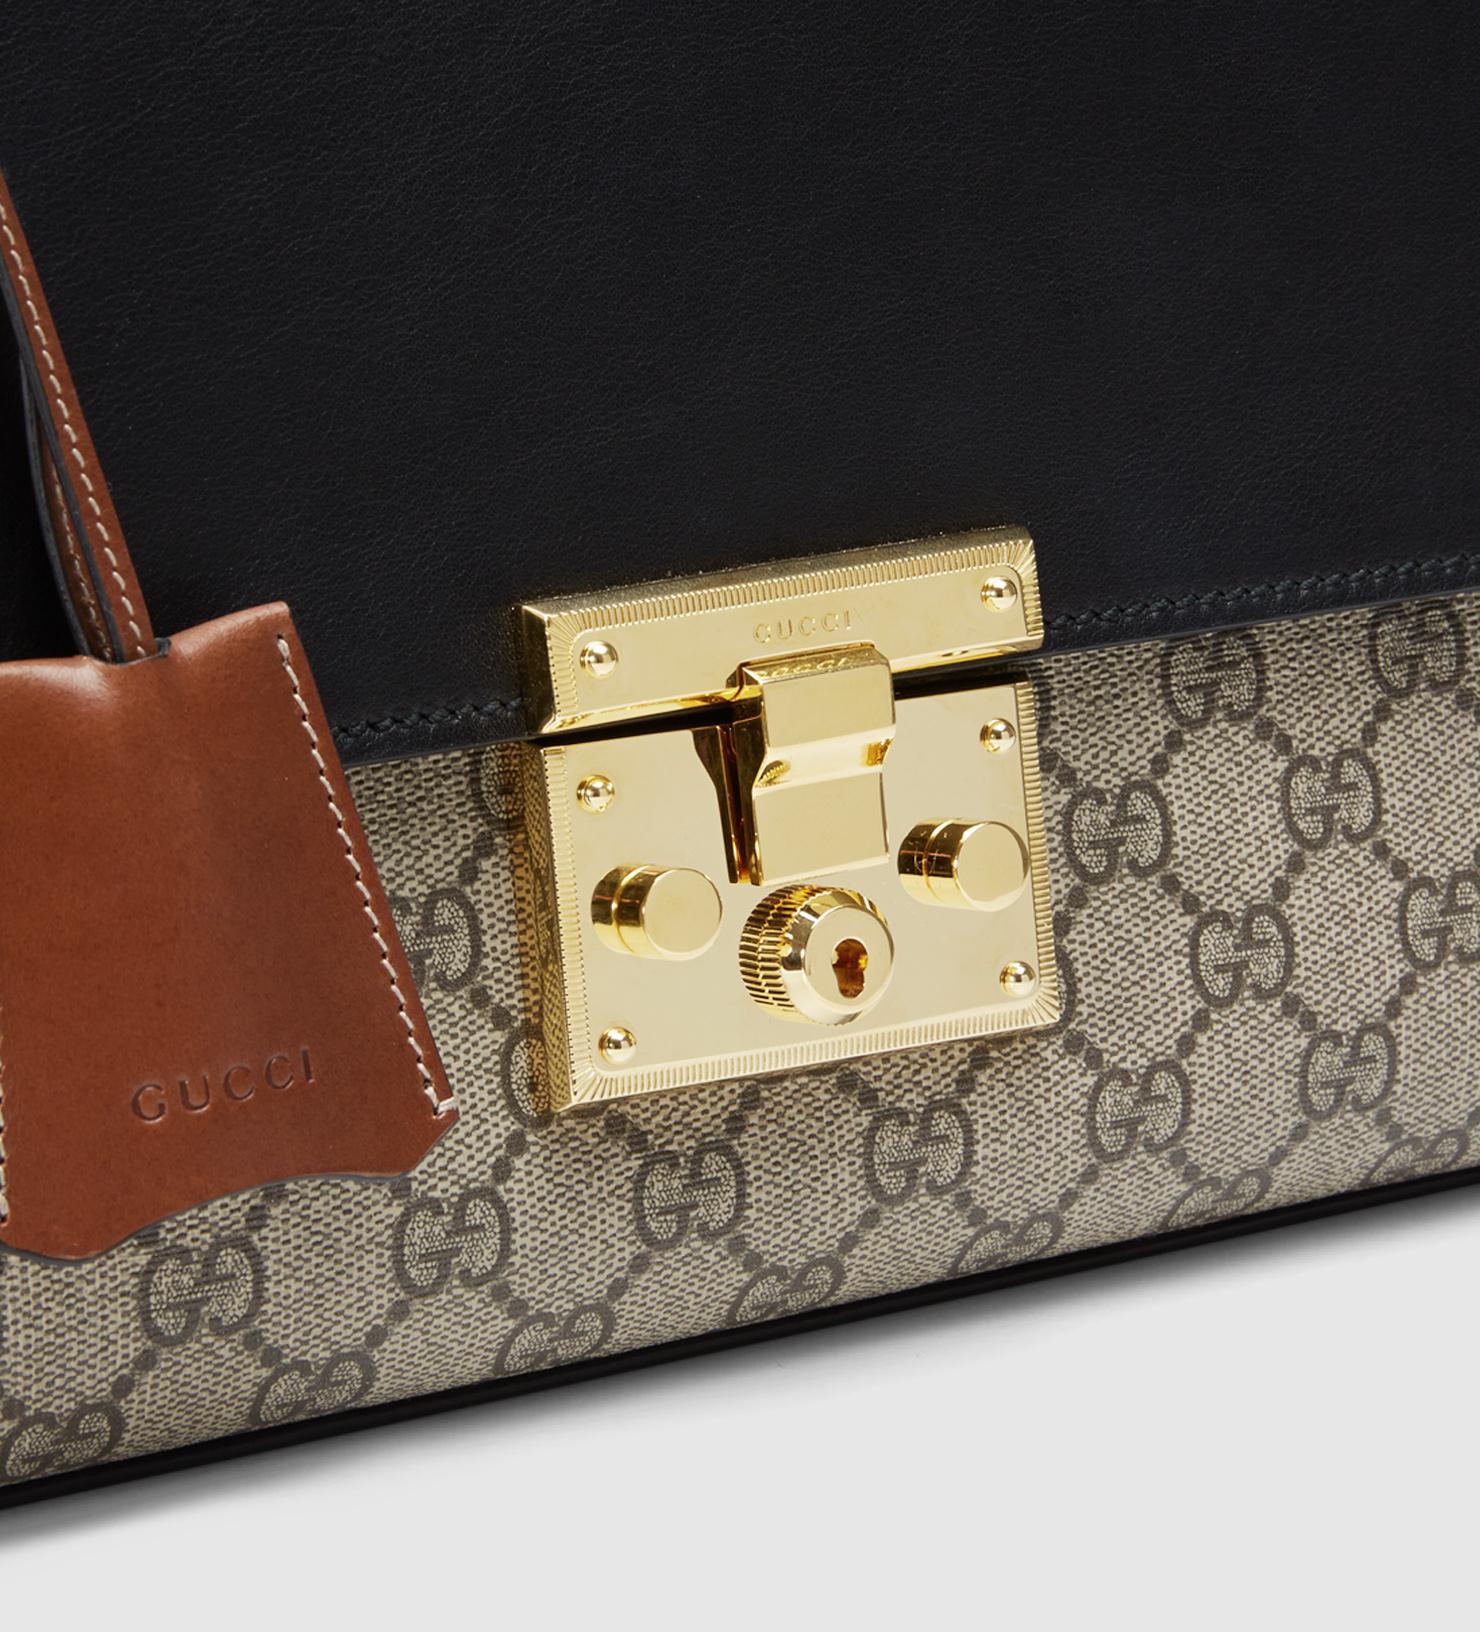 6284bba9792 Lyst - Gucci Padlock Gg Supreme Shoulder Bag in Brown